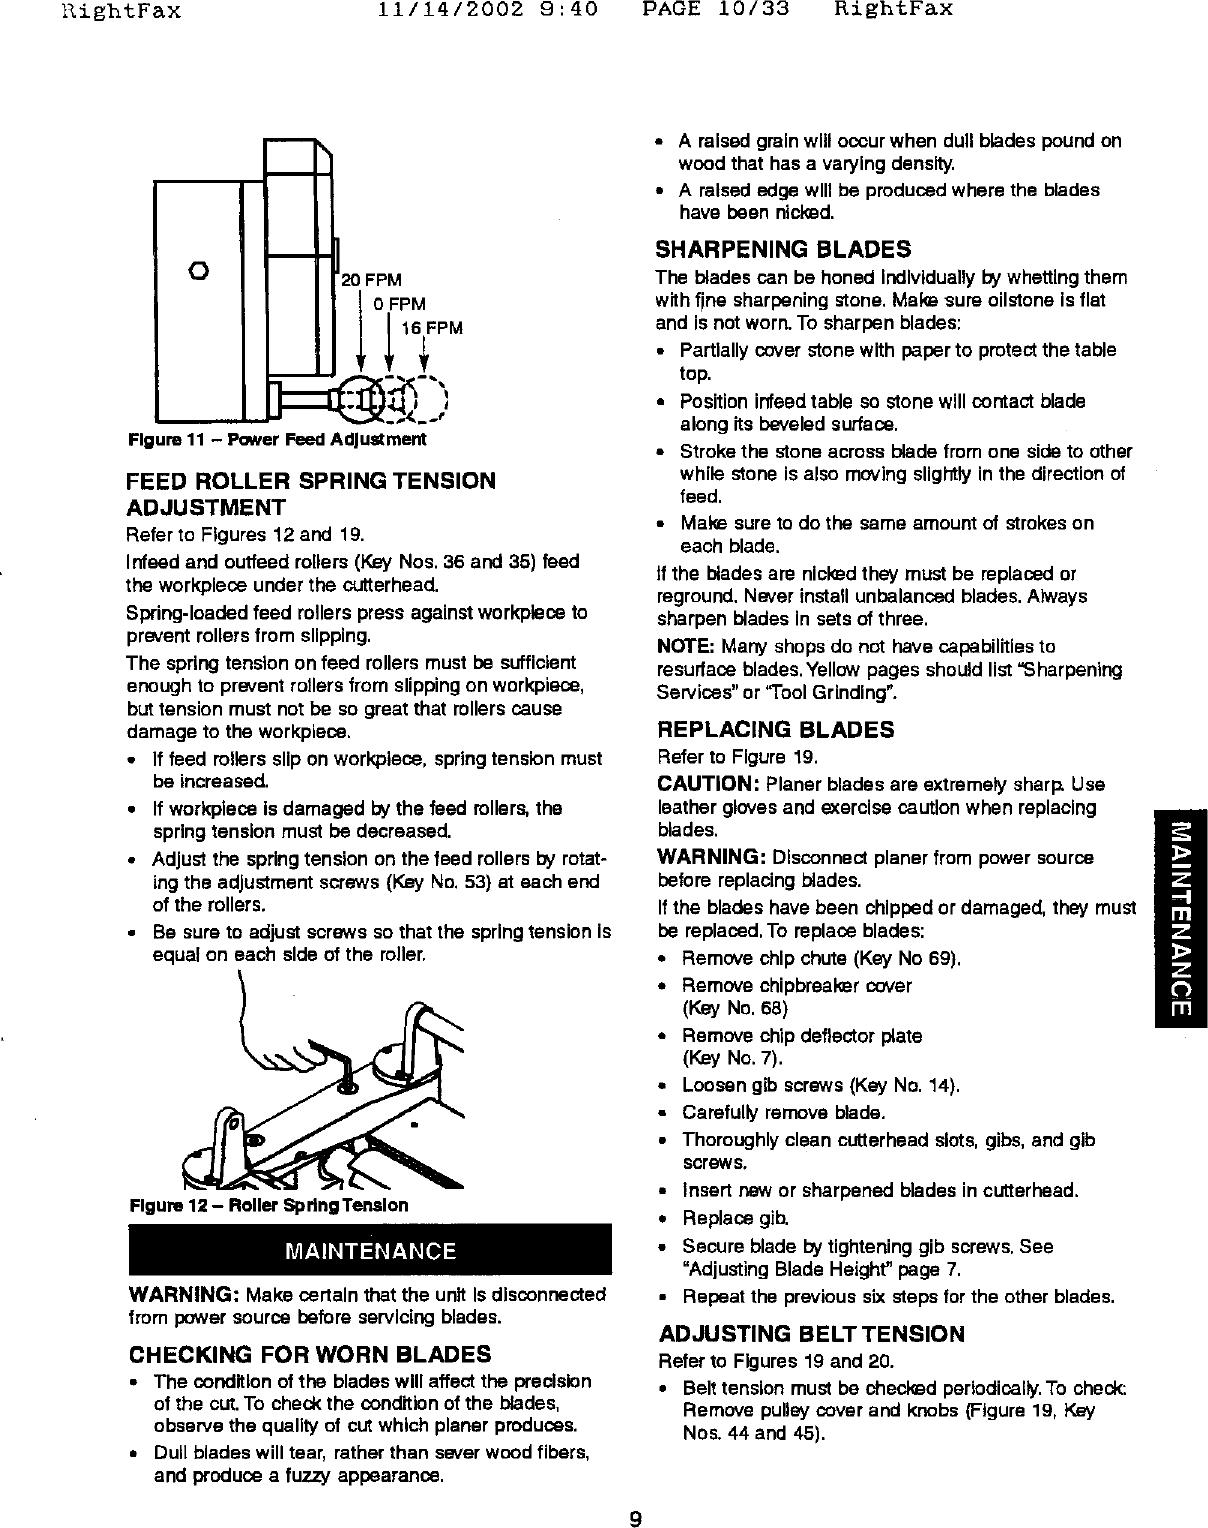 Craftsman 351226151 User Manual PLANER Manuals And Guides L0606319